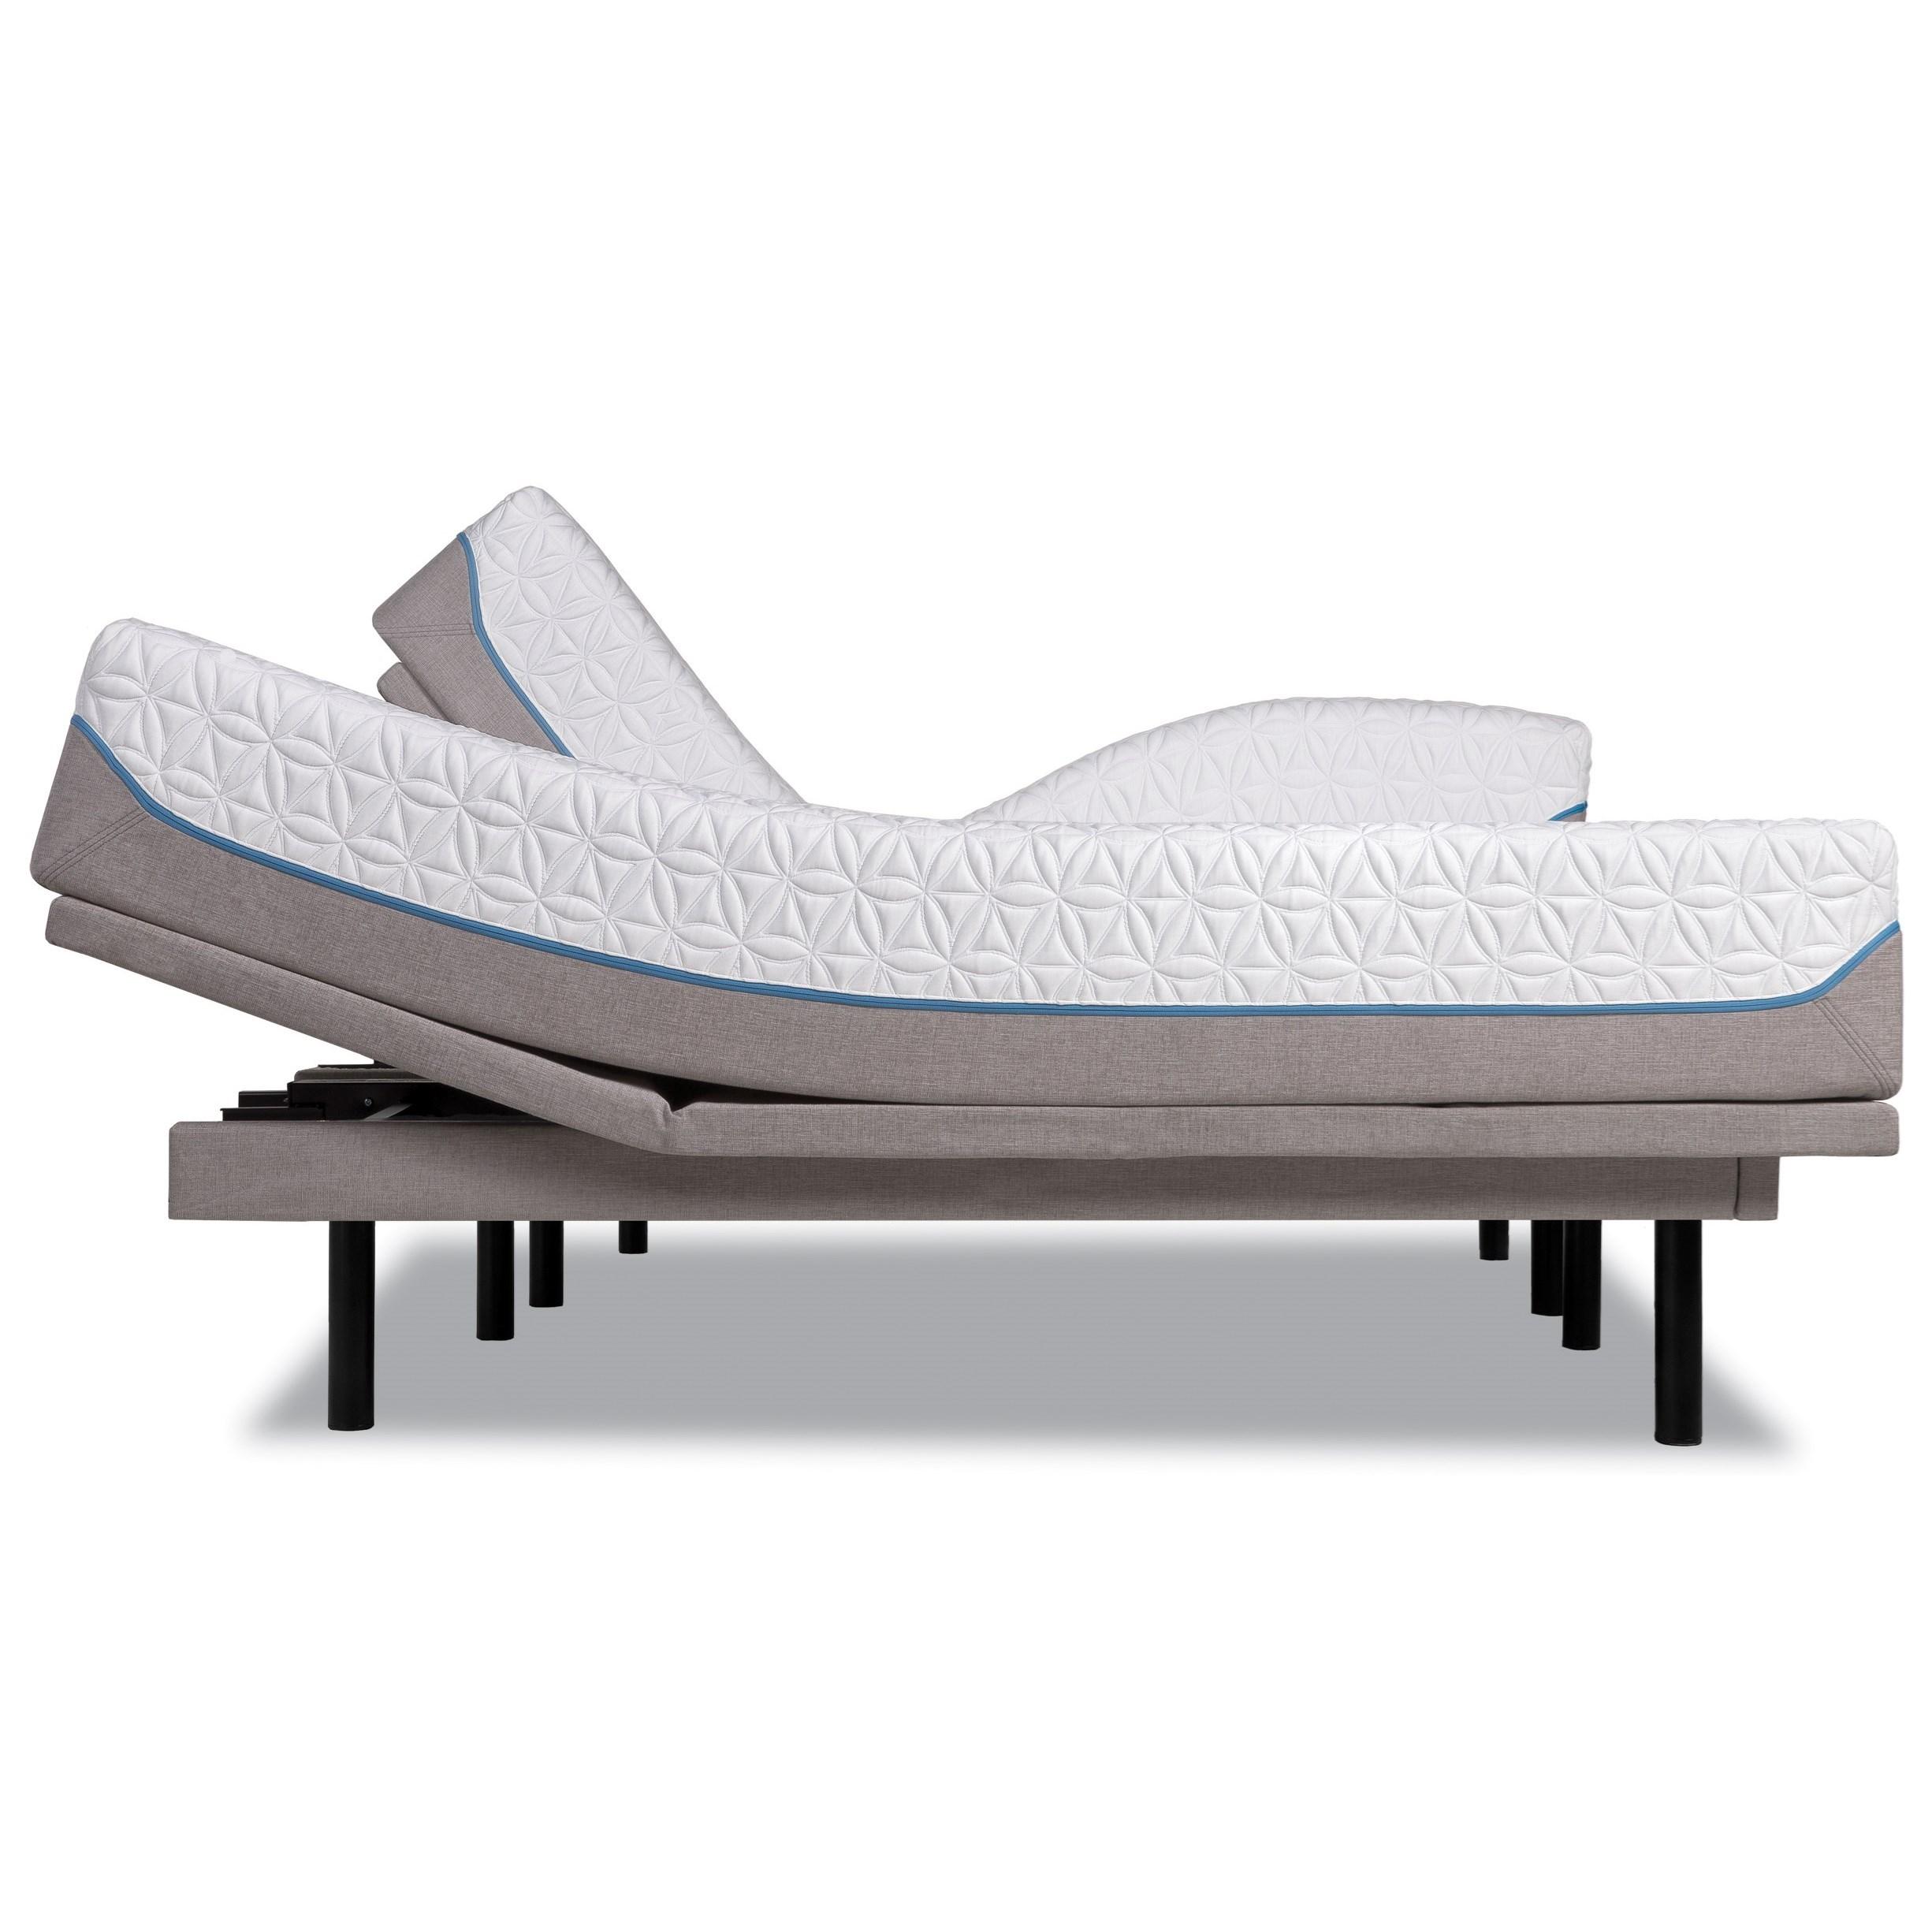 Tempur-Pedic® TEMPUR-Cloud Supreme Twin Soft Mattress Set - Item Number: 10240210+25289210